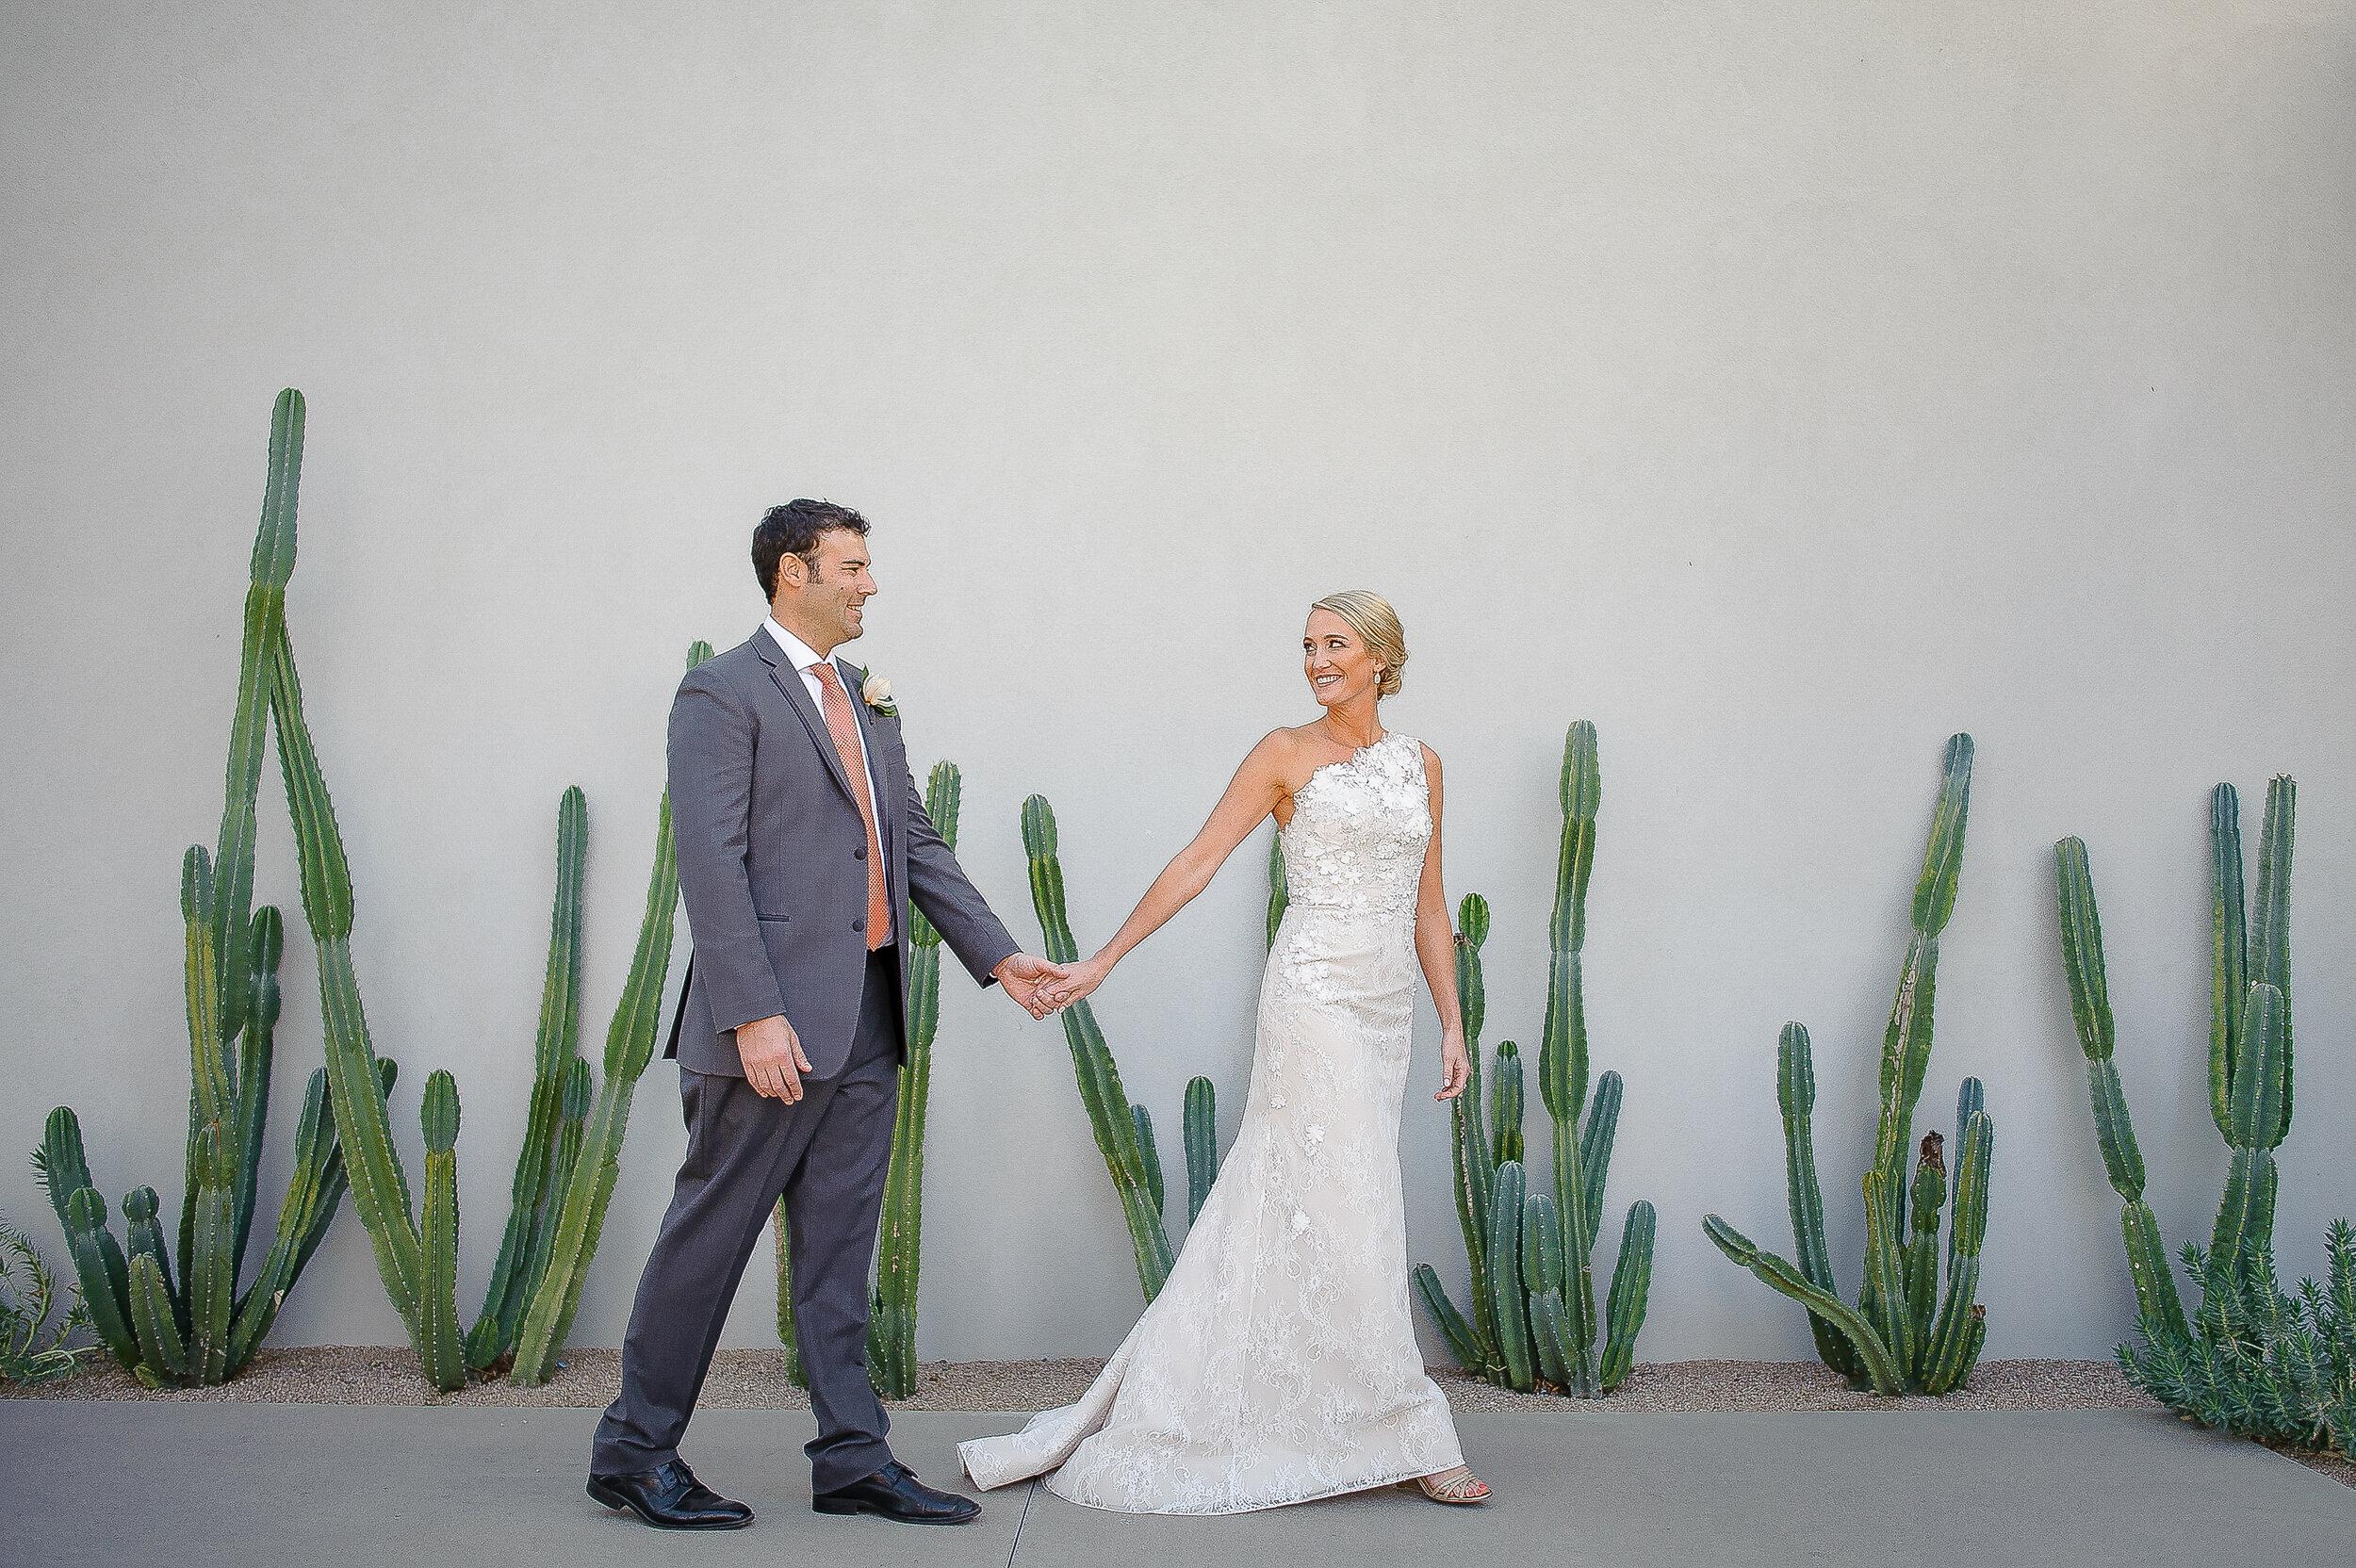 Winter Phoenix resort wedding52.jpg